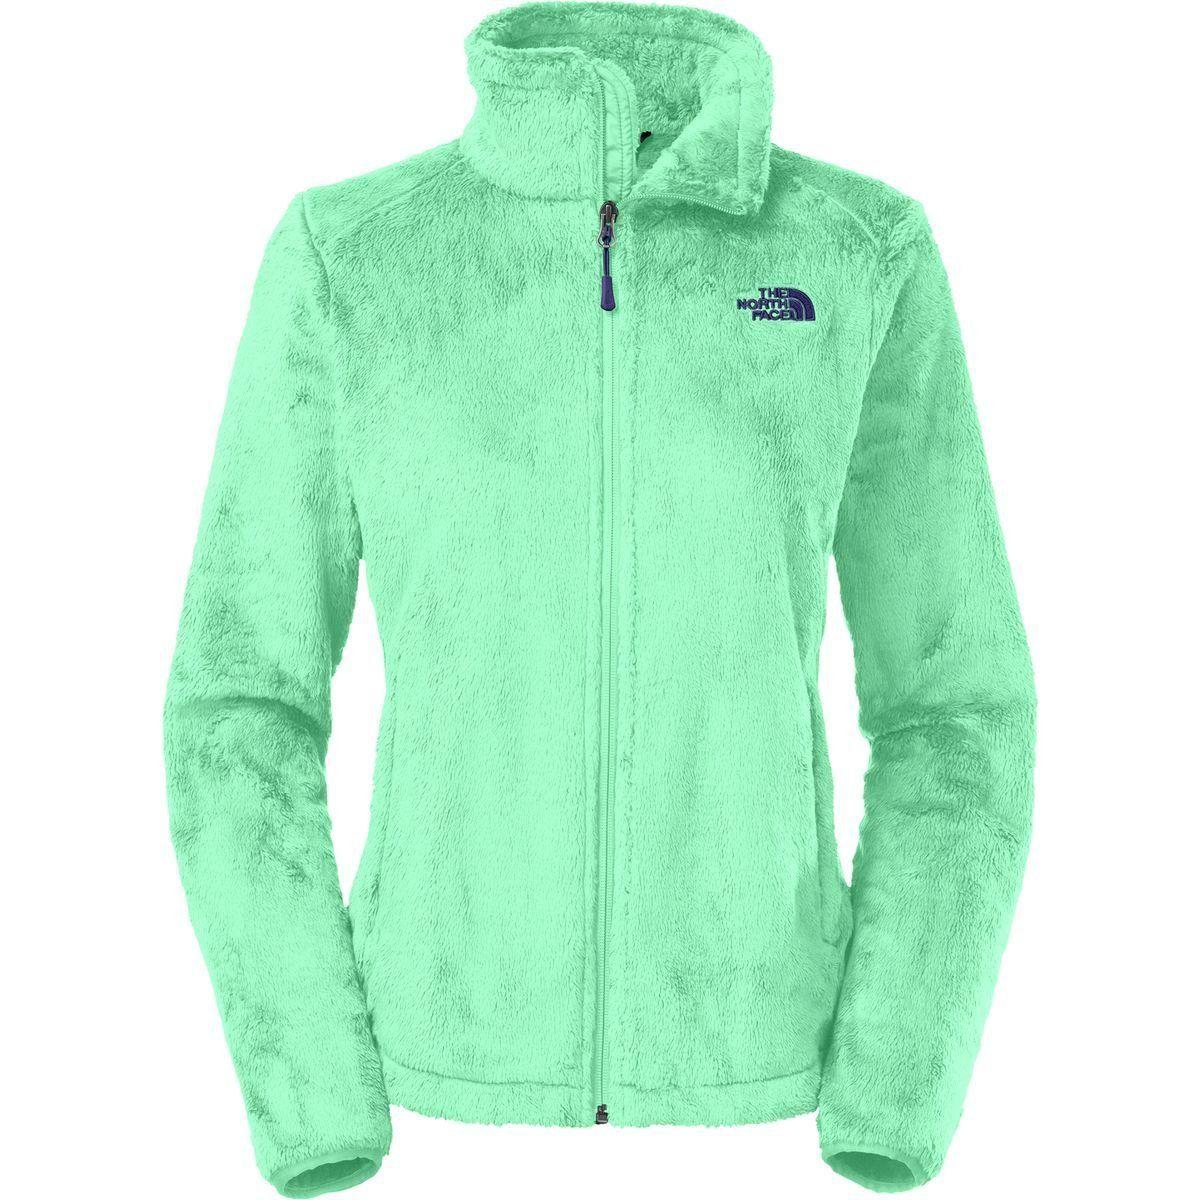 Amazon Com The North Face Women S Osito 2 Jacket Surf Green L Clothing Fleece Jacket Womens Sporty Jacket Fleece Jacket [ 1200 x 1200 Pixel ]